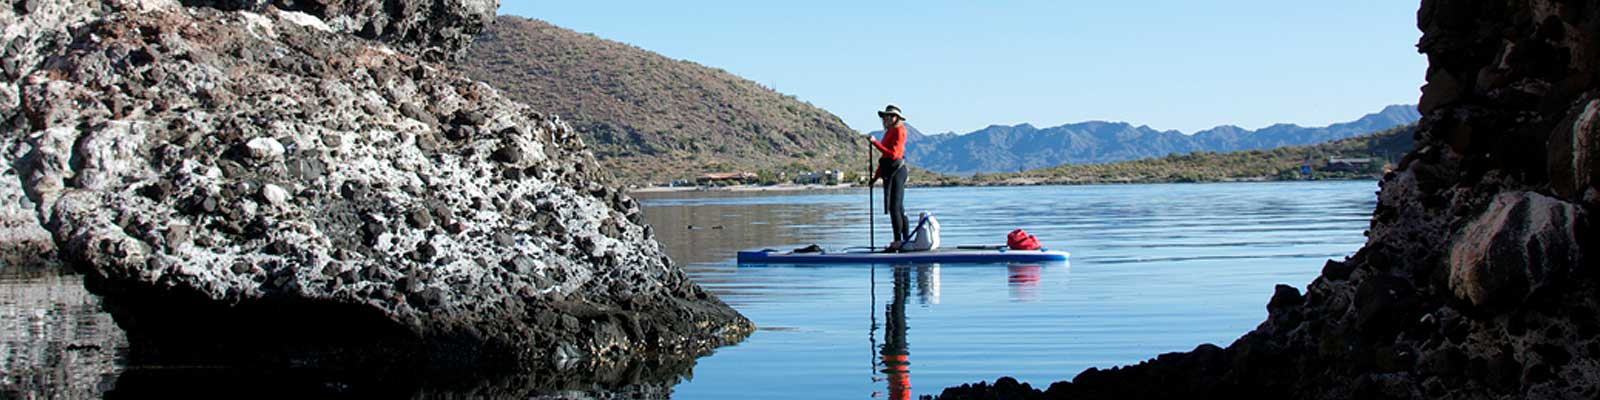 Carla King paddleboard Baja Sea of Cortez Mulege